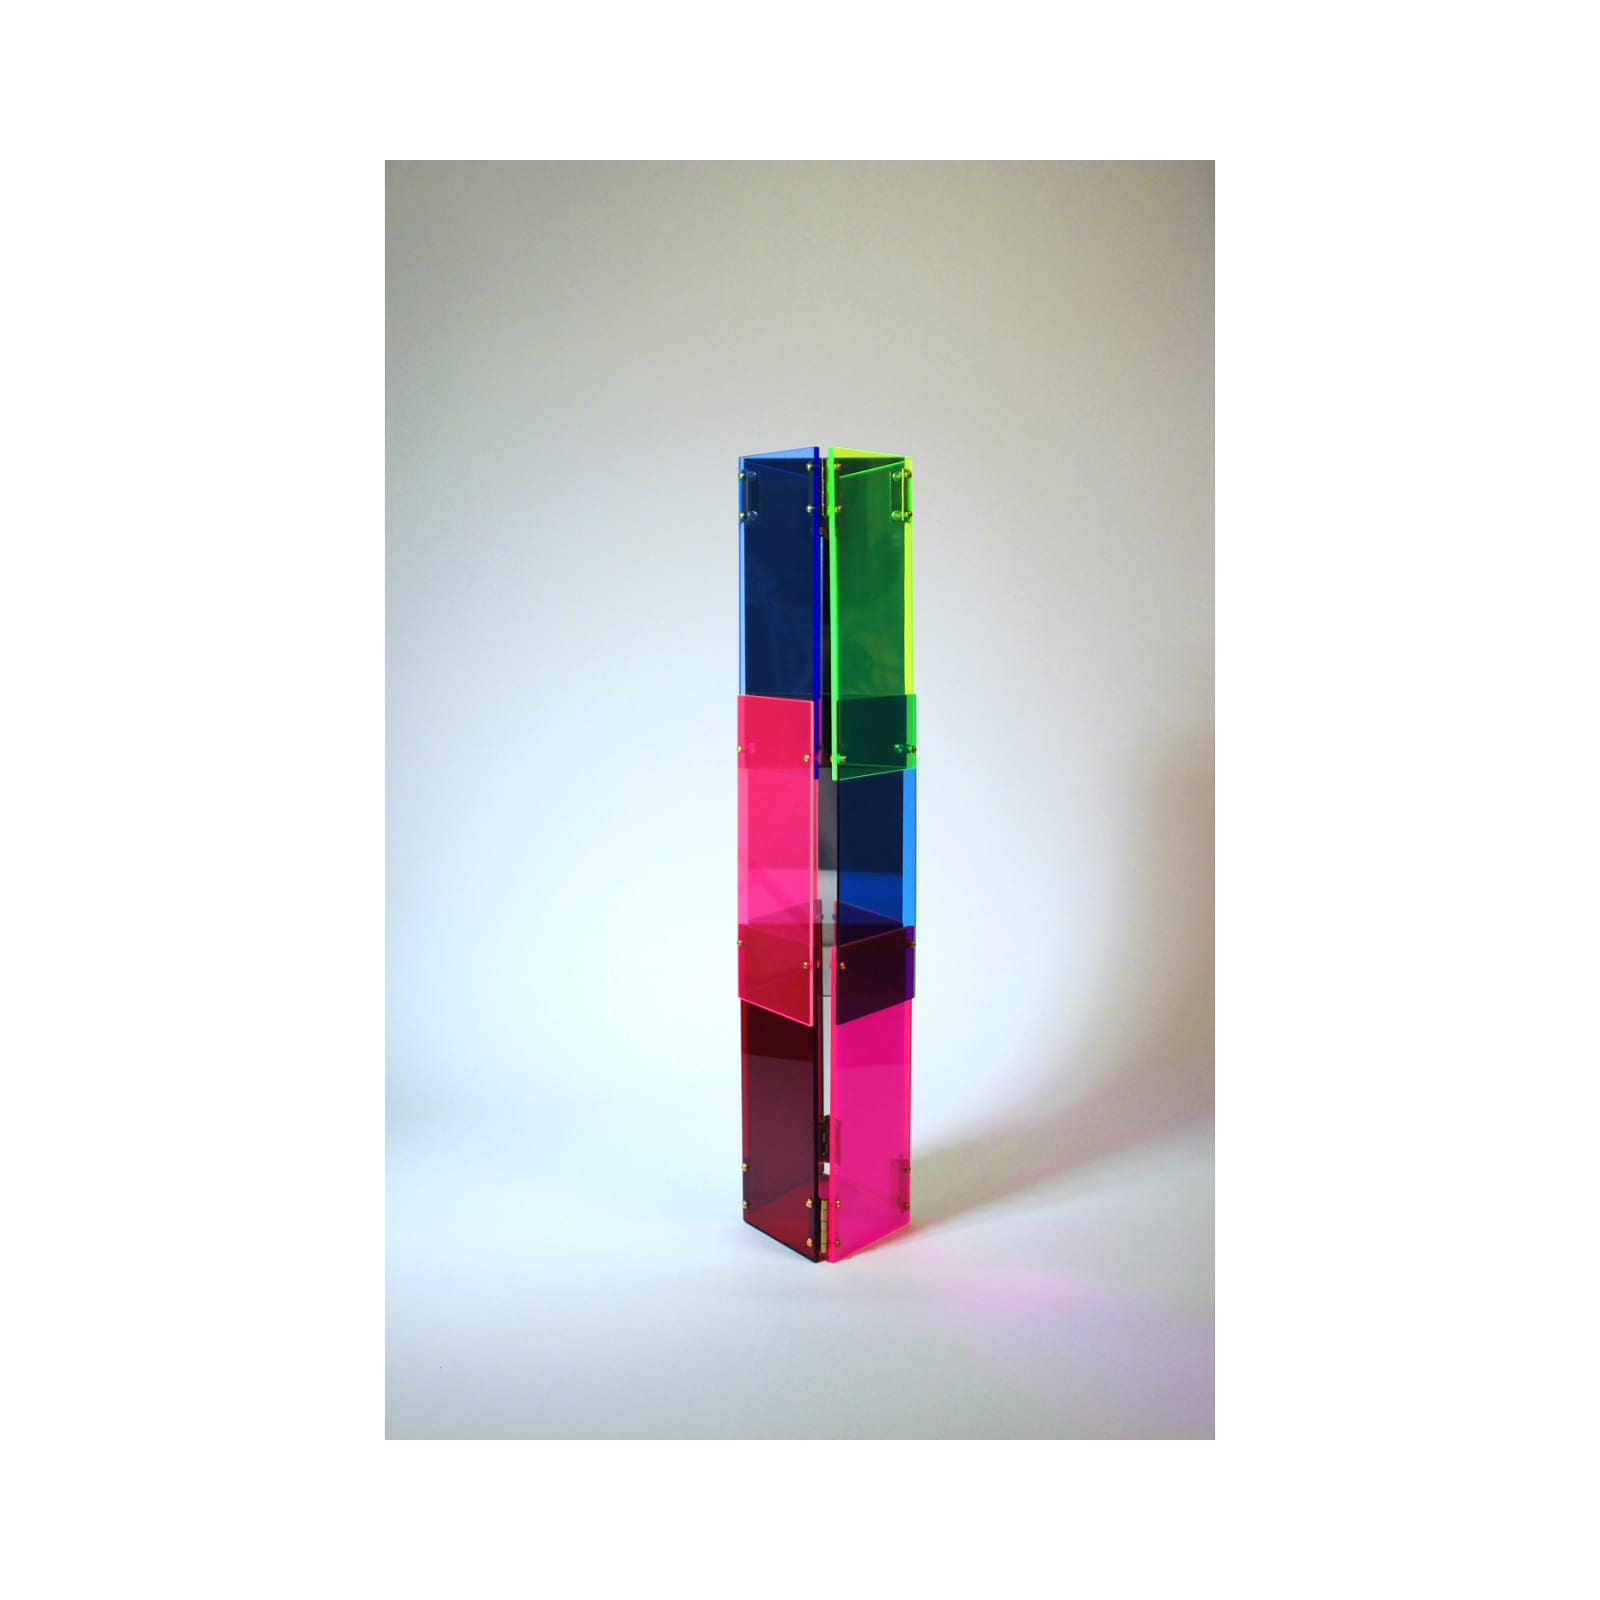 Anne Katrine Senstad  Babel 05, 2020  Lucite/Plexiglas, mirrors, brass door hinges, brass screws, bolts and washers  30 x 7 x 8 in  76.2 x 17.8 x 20.3 cm  Series: Circle of Babel